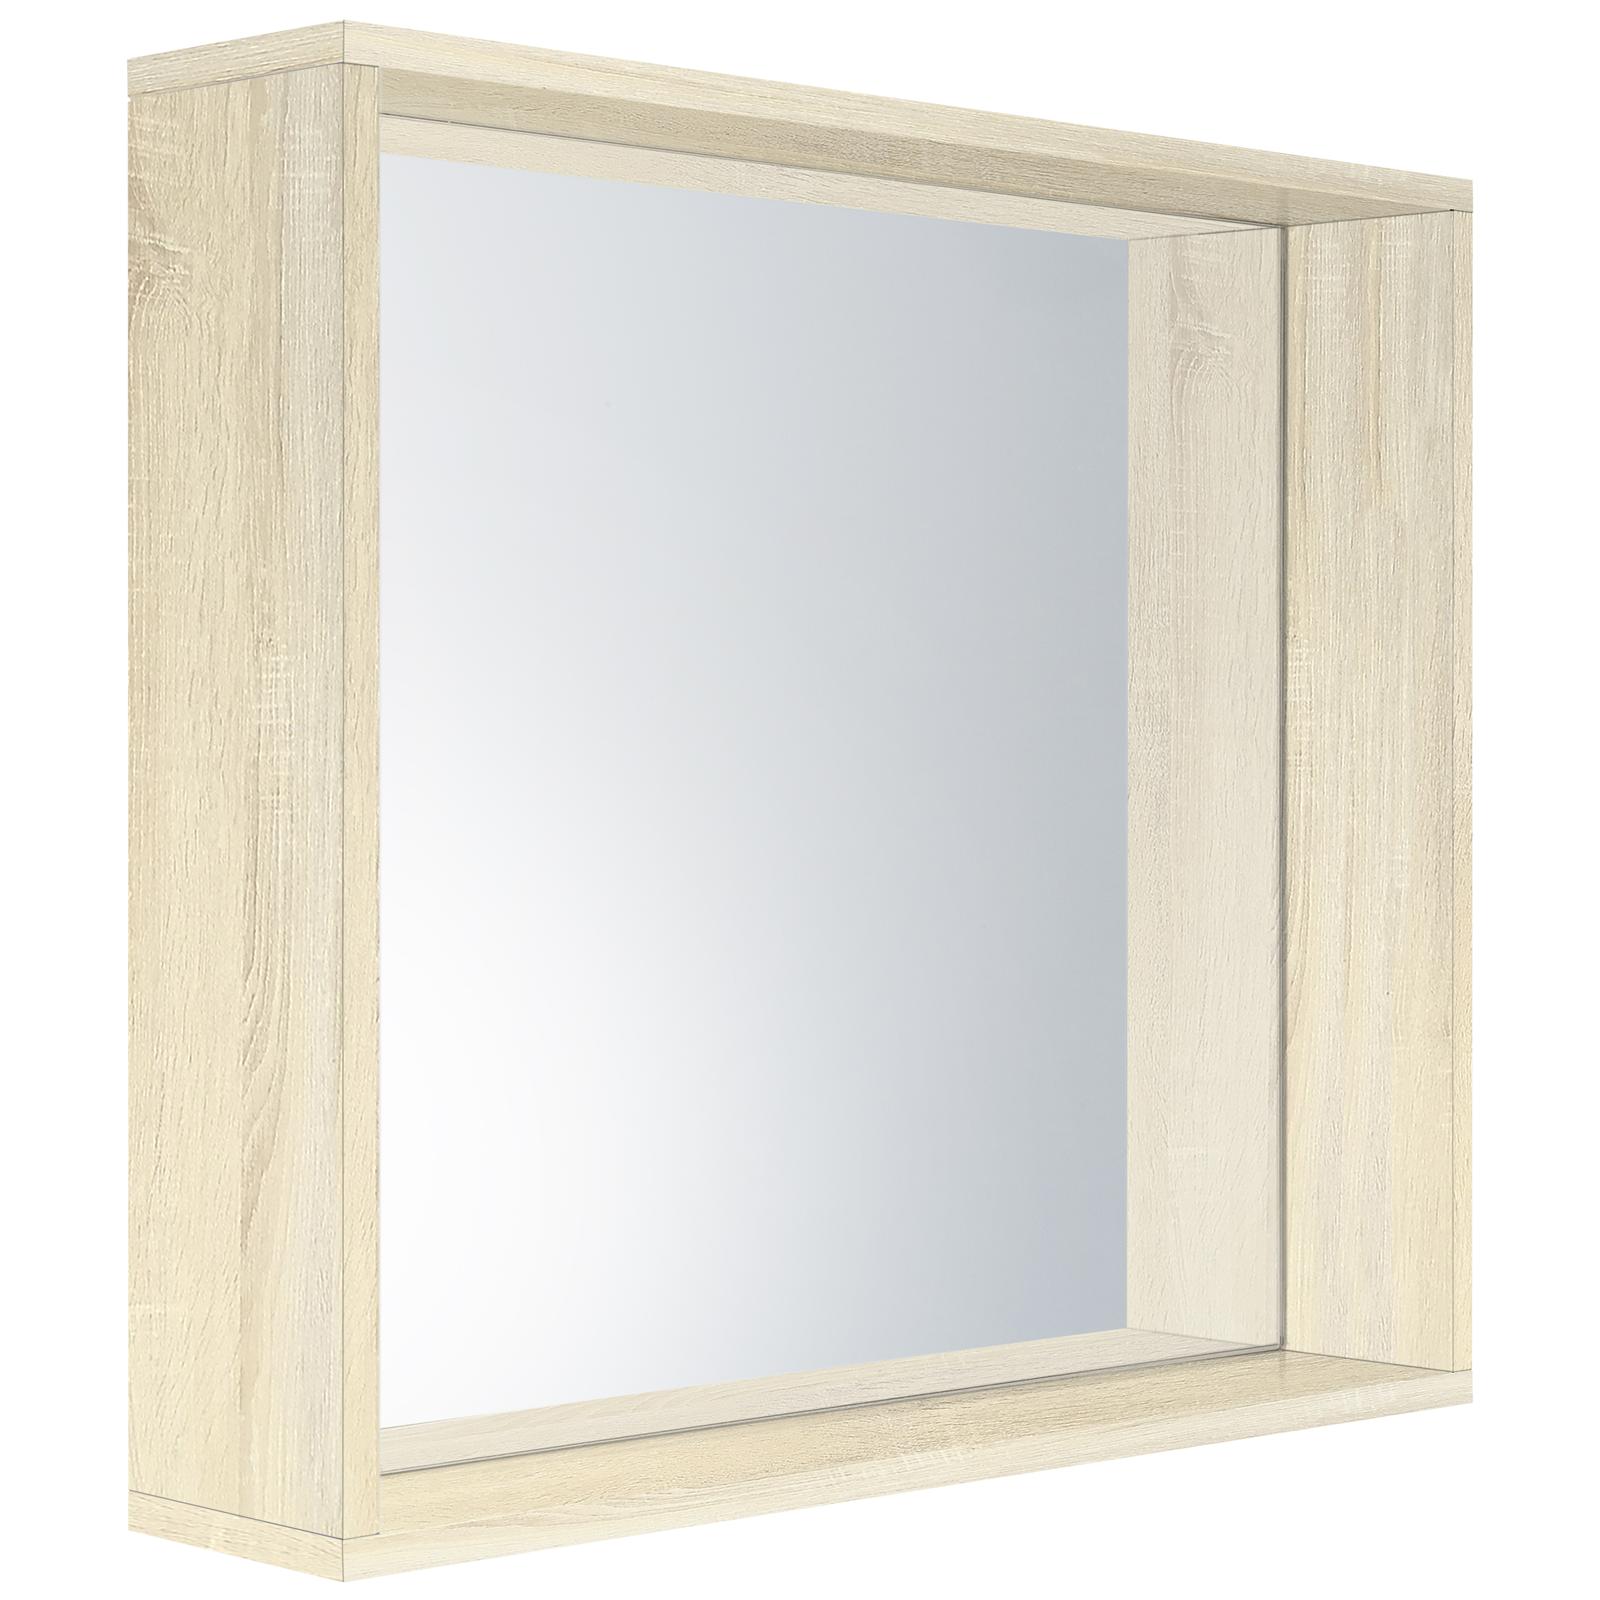 bunnings cibo design 600 x 600mm fresh frame mirror 203 00